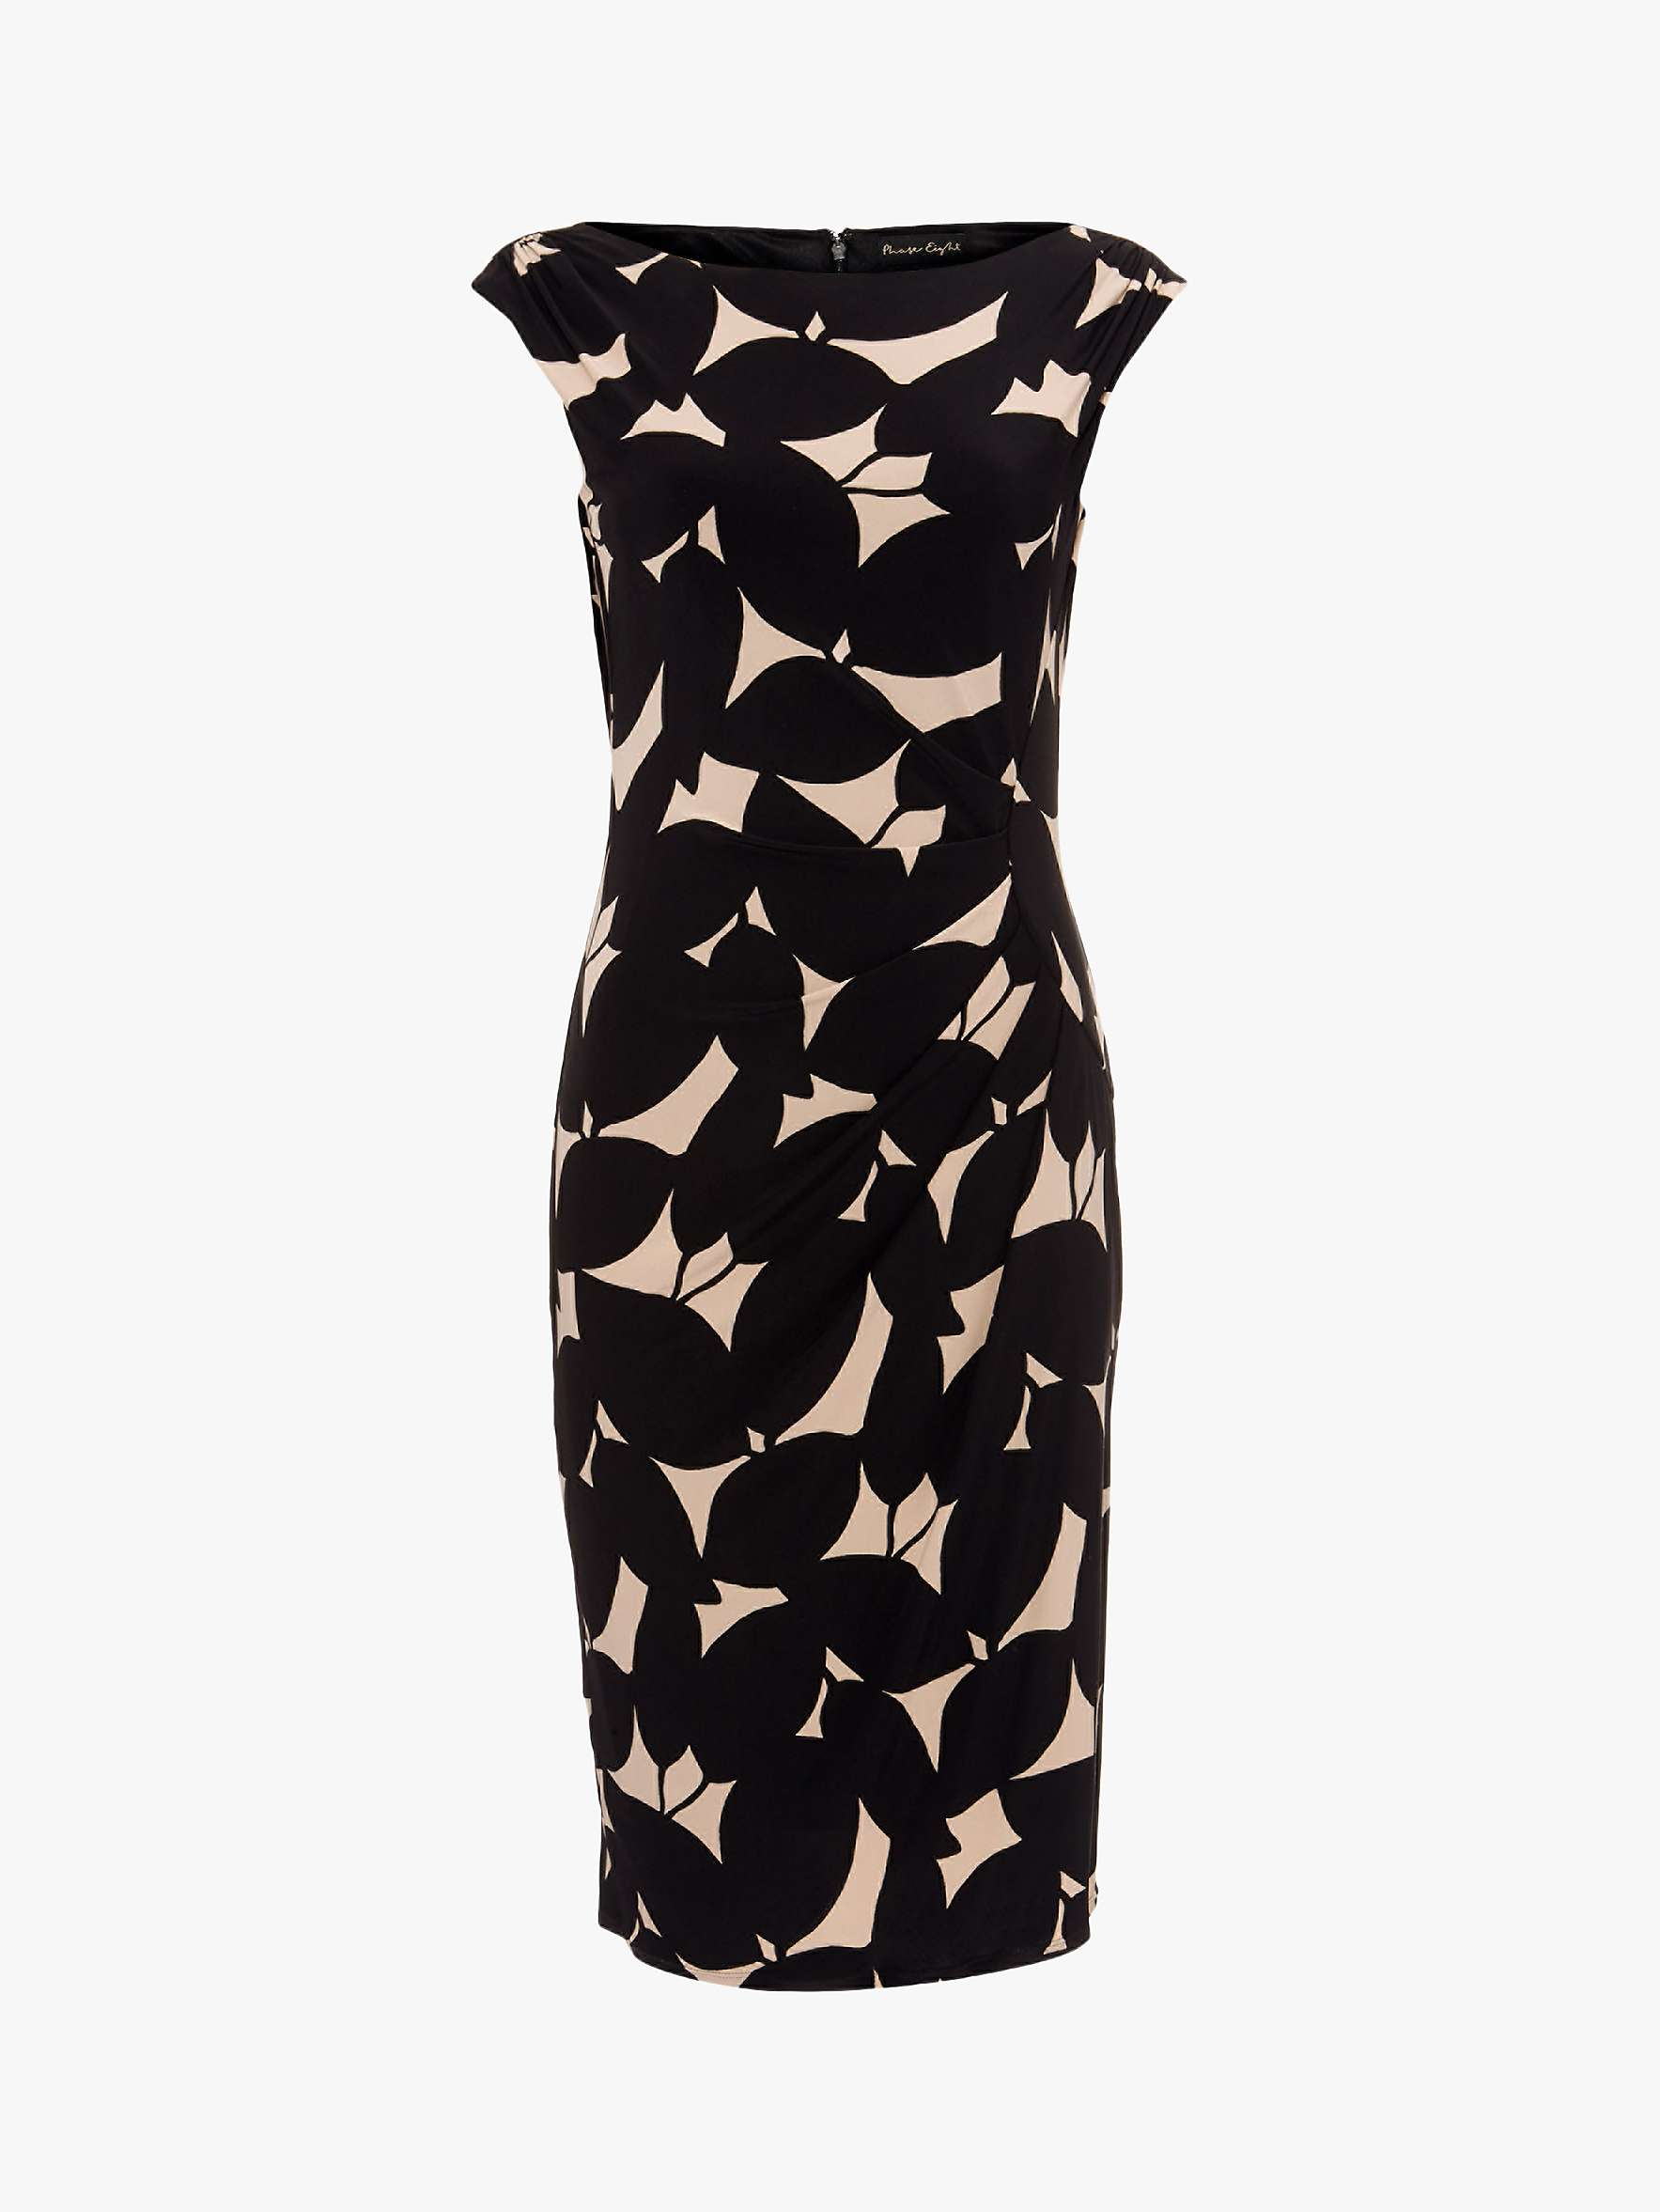 Phase Eight Laurita Leaf Dress, Black/Camel